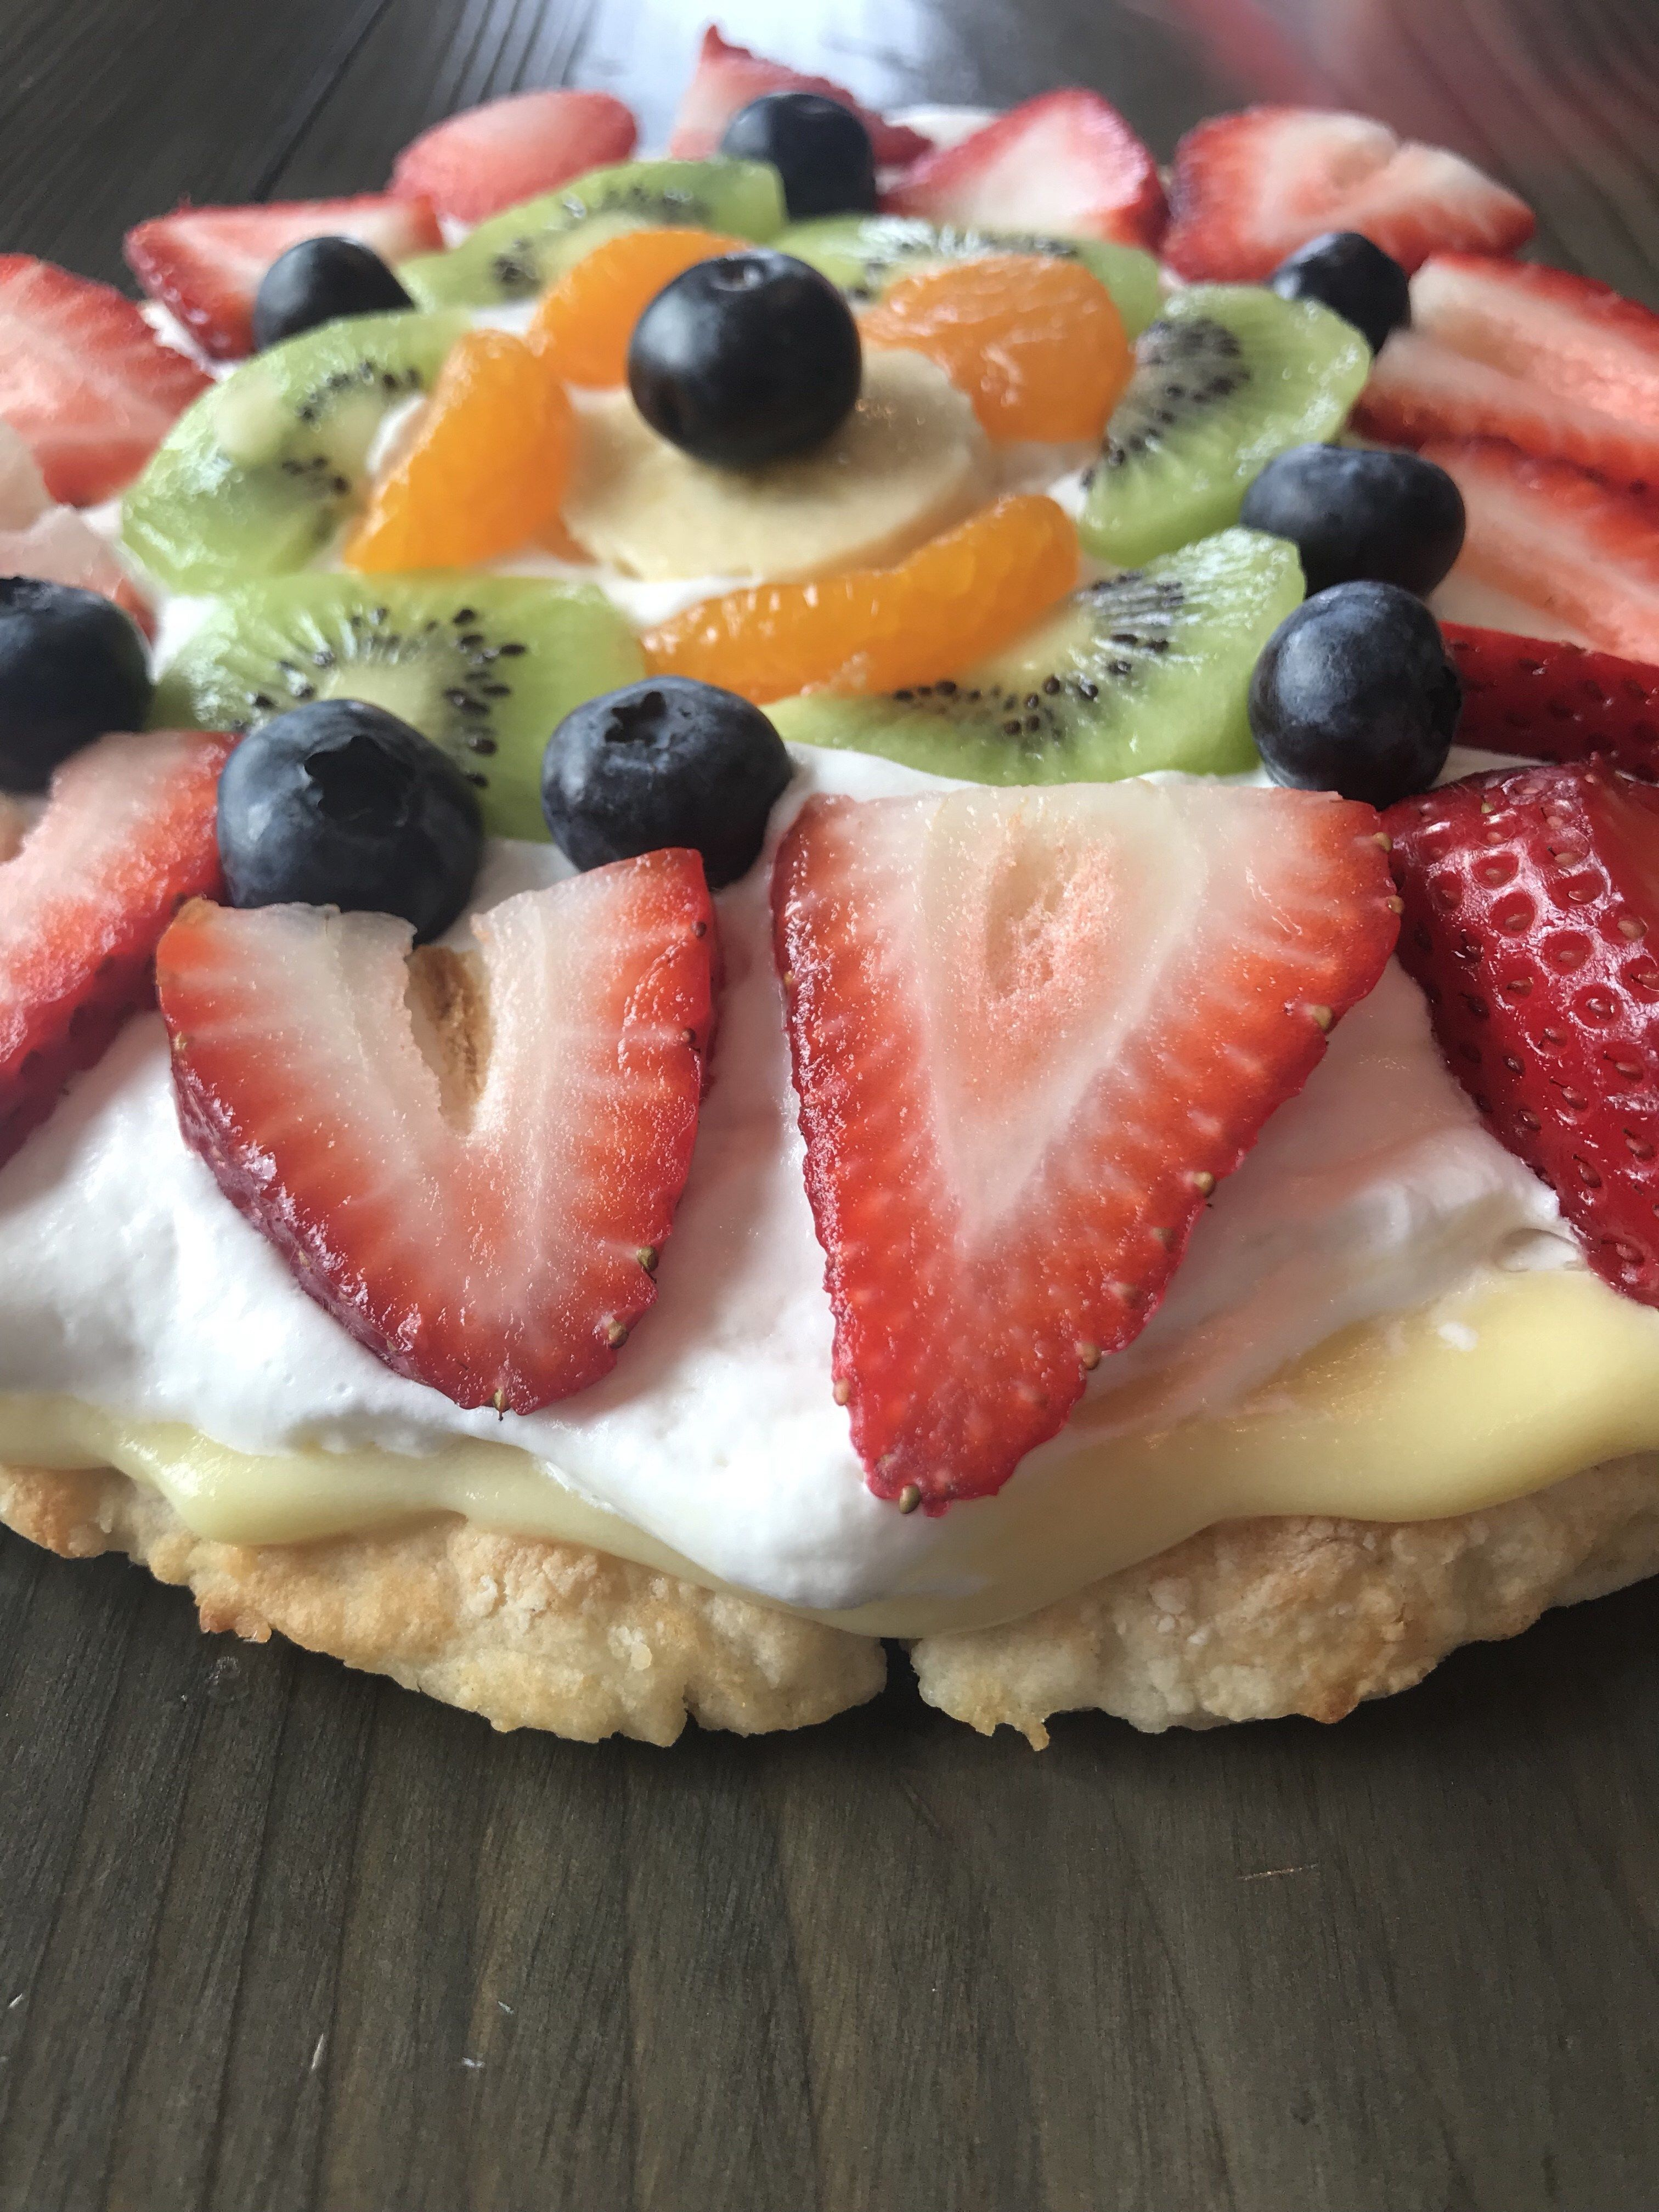 Two Ingredient Dough Fruit Tart, 1 Serving = 1 Freestyle Point